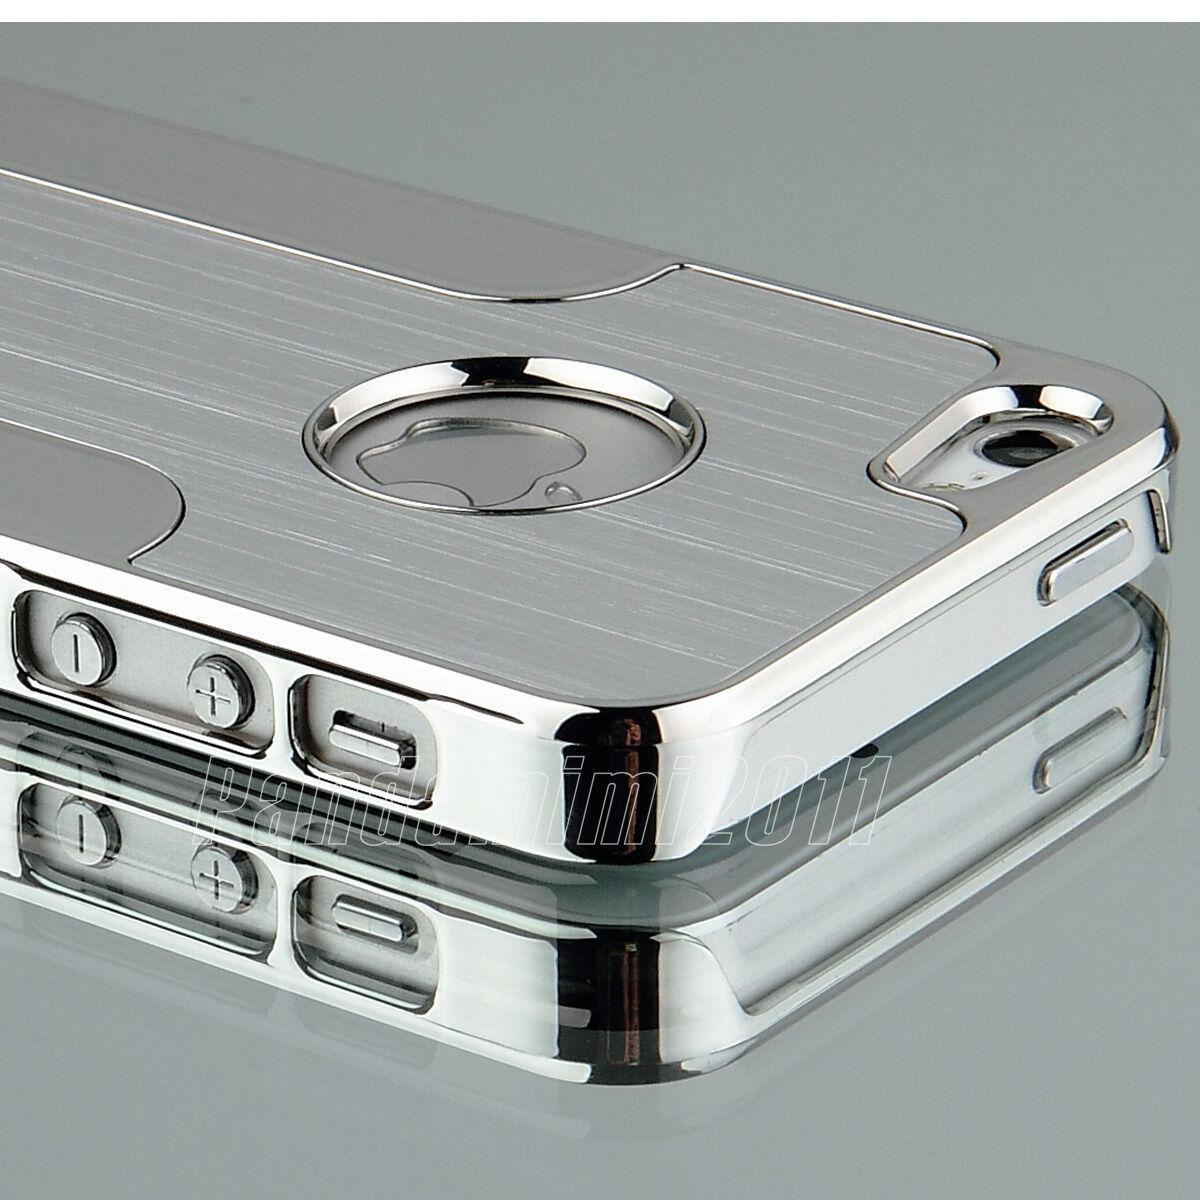 Silver Luxury Brushed Aluminum Chrome Hard Case For iPhone 5 5G 6th+Stylus+Film